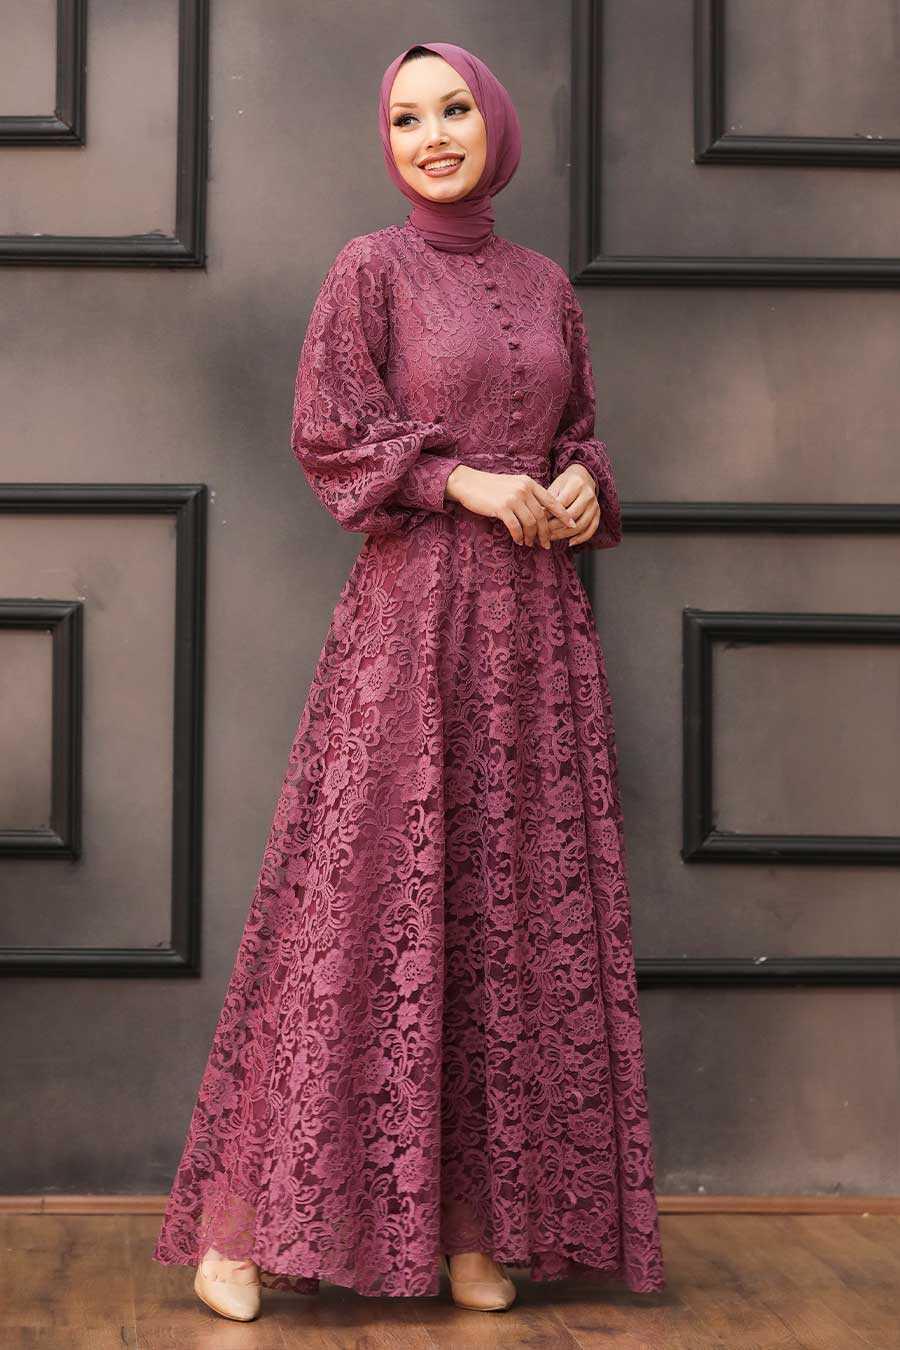 Dusty Rose Hijab Evening Dress 5477GK